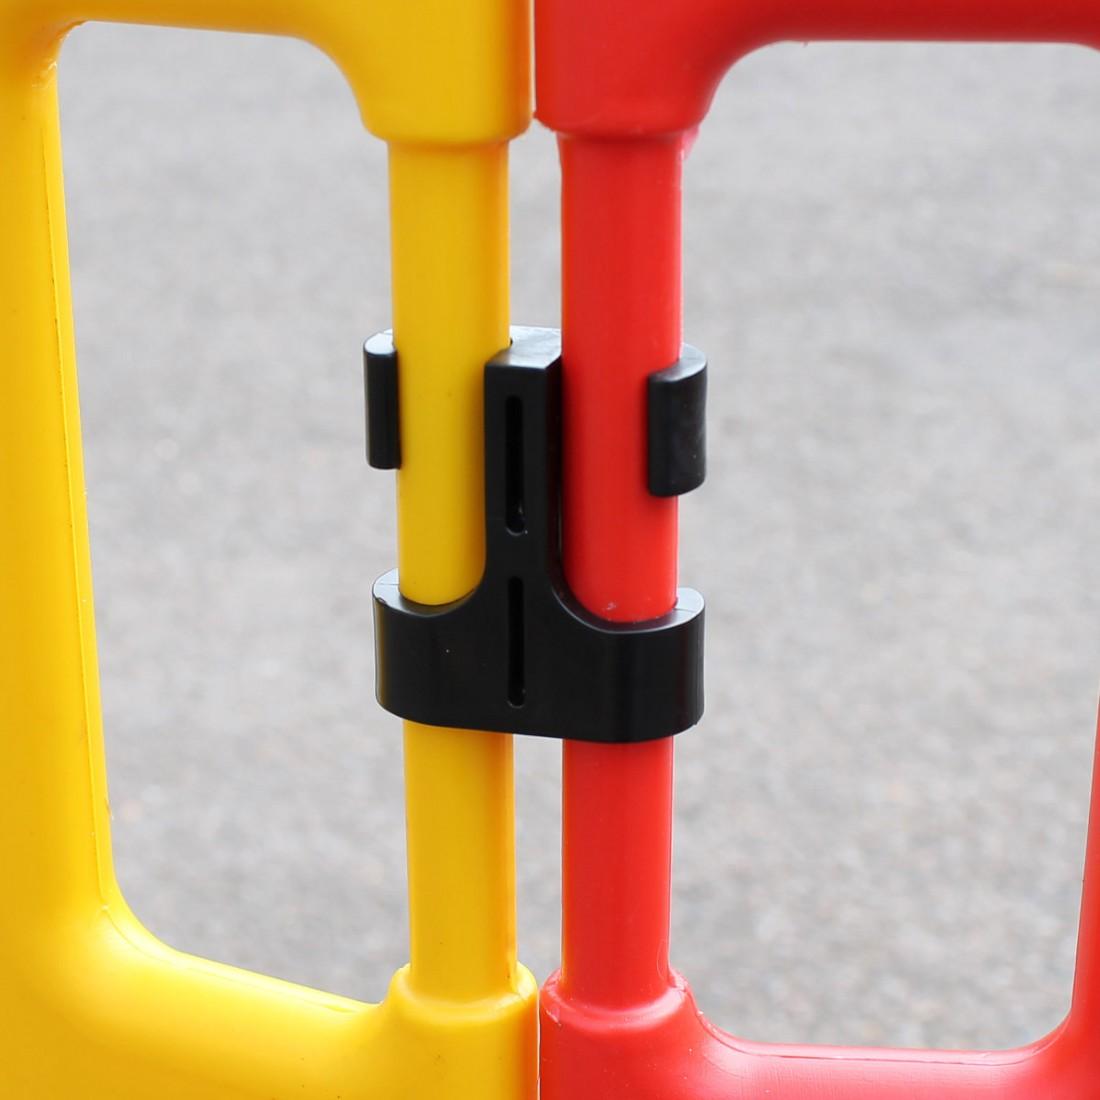 Oxford Safegate Folding Communication Manhole Plastic Barrier - Hinge Clip